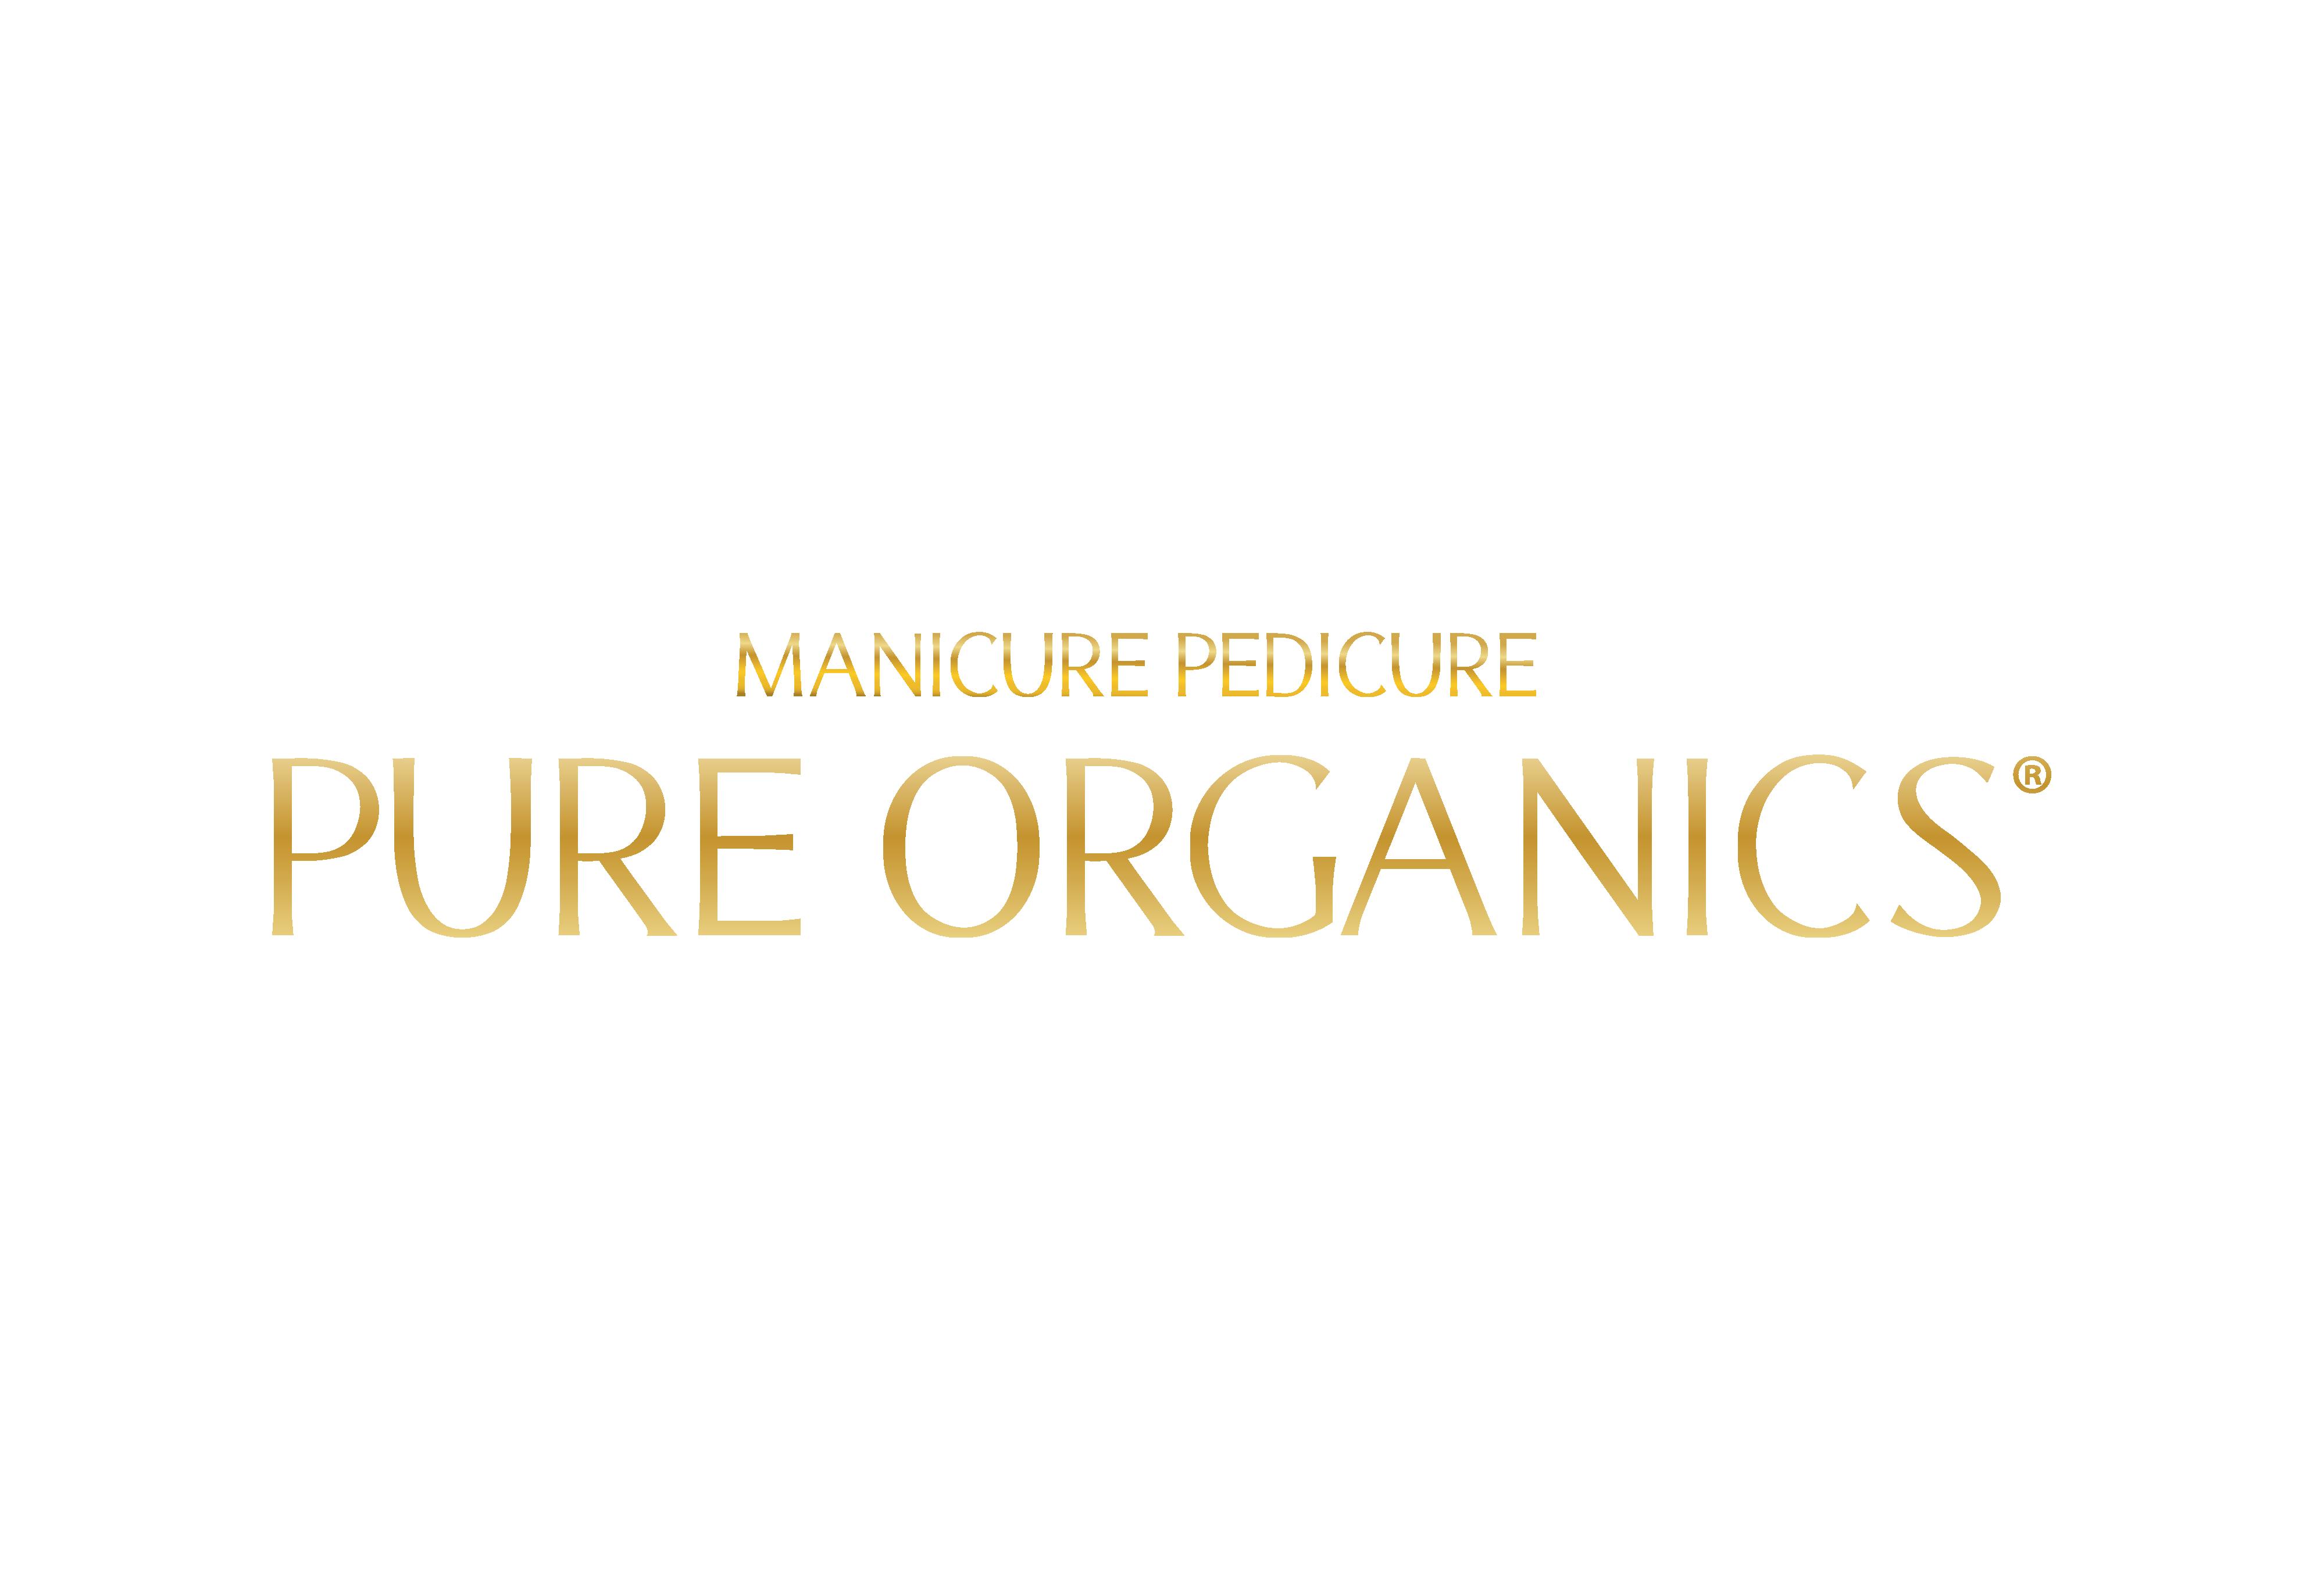 Pure Organics